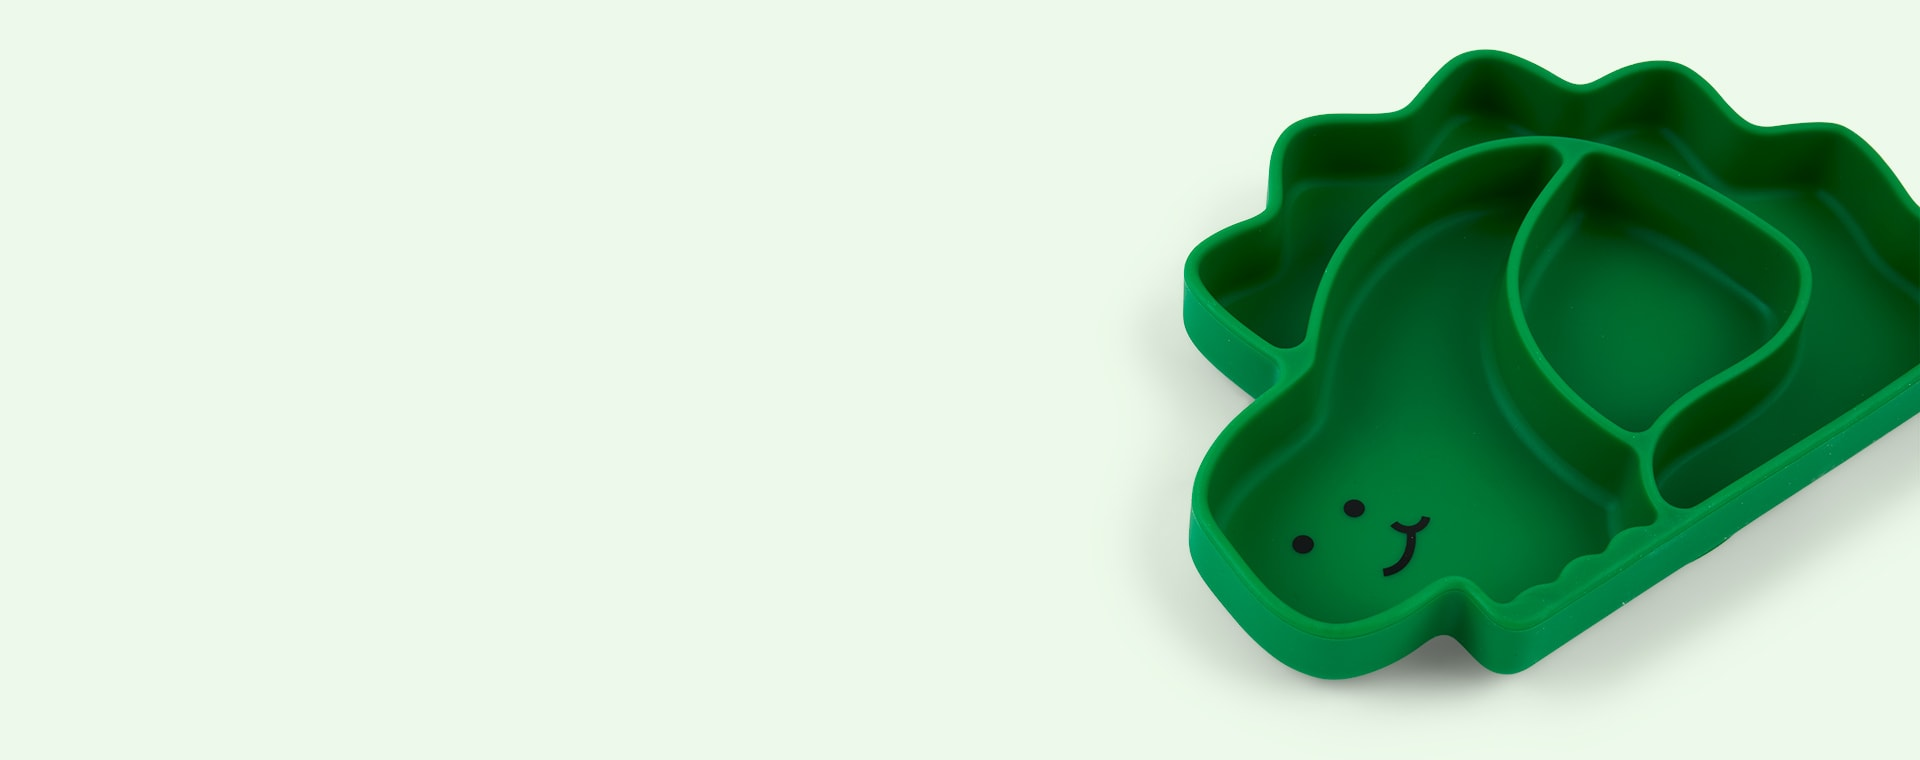 Dinosaur Bumkins Silicone Animal Grip Dish